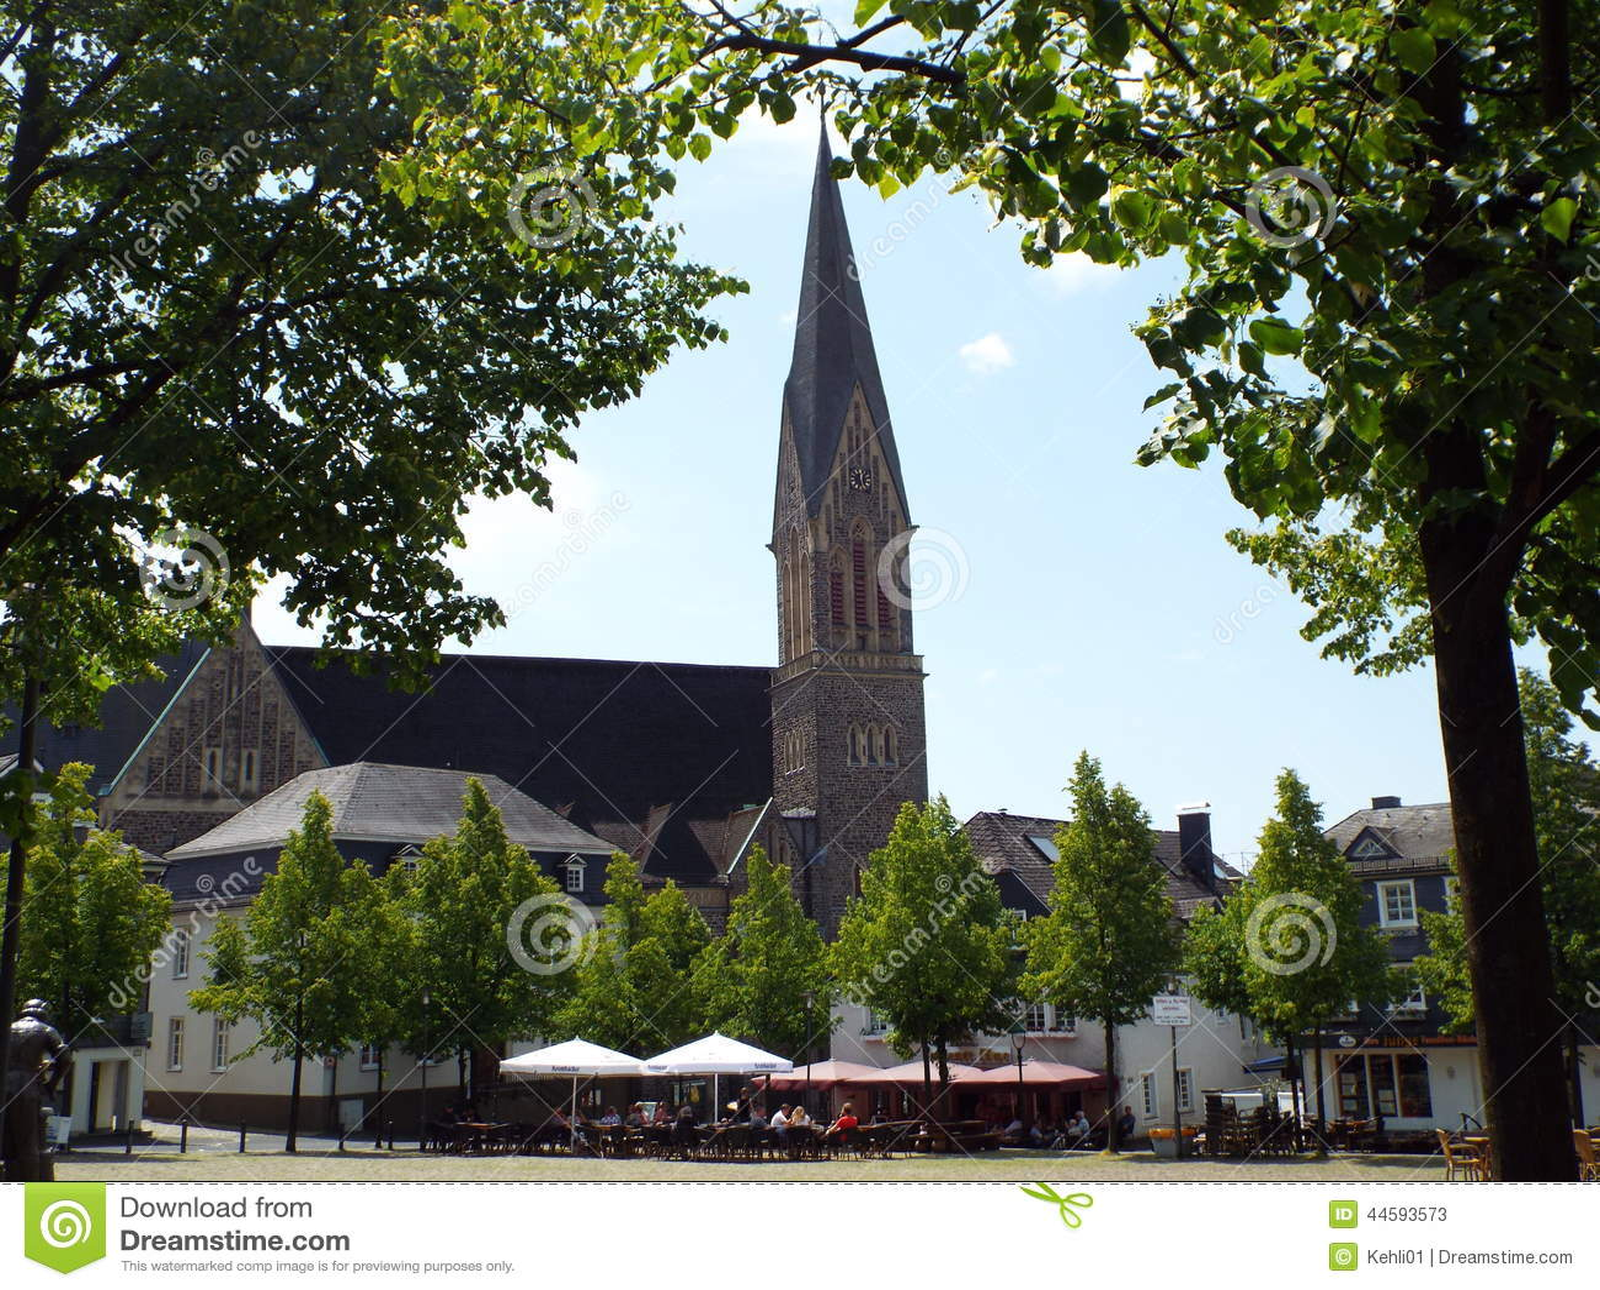 Olpe Germany  city photos gallery : Germany, Olpe, 2014 The Catholic parish church of St Martin, newly ...